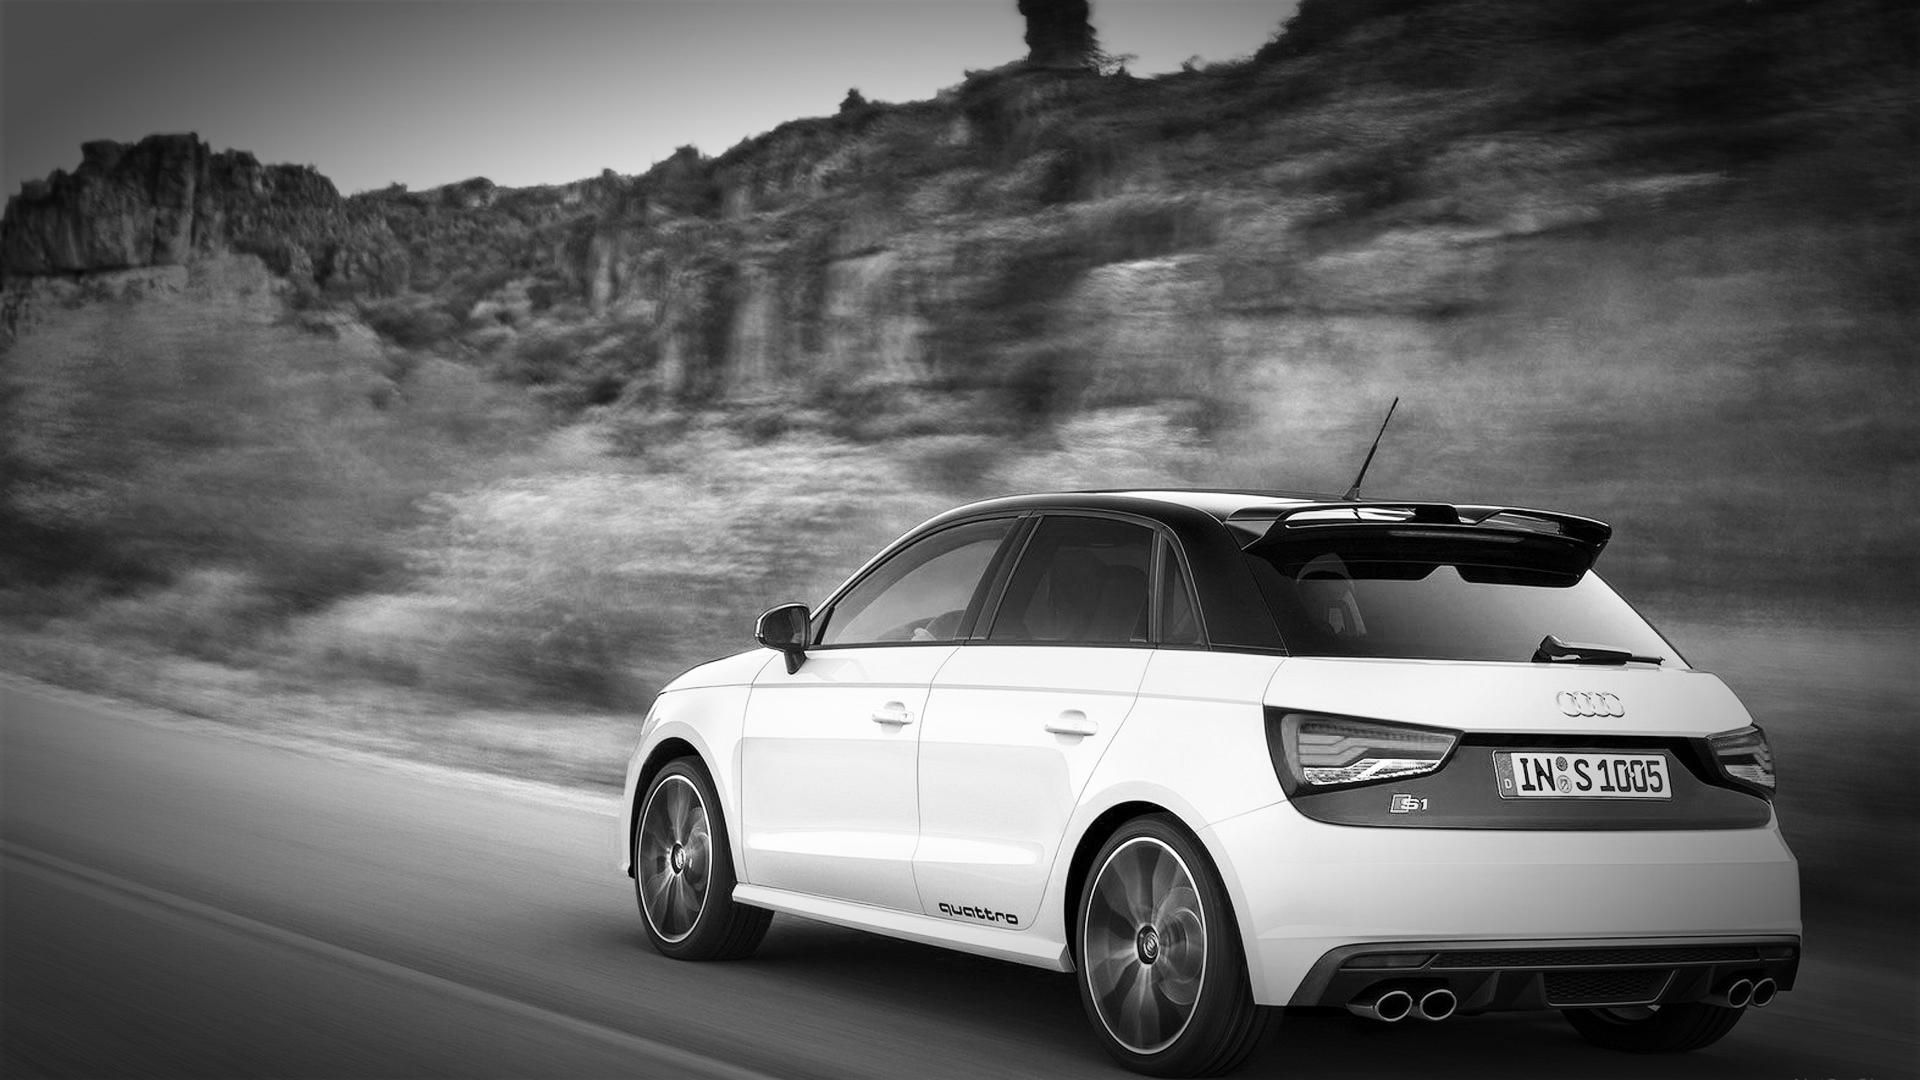 2015 Audi S1 Sportback White 2015 Audi S1 Sportback Sport Car And Great Performance Audi Sports Cars Car Design